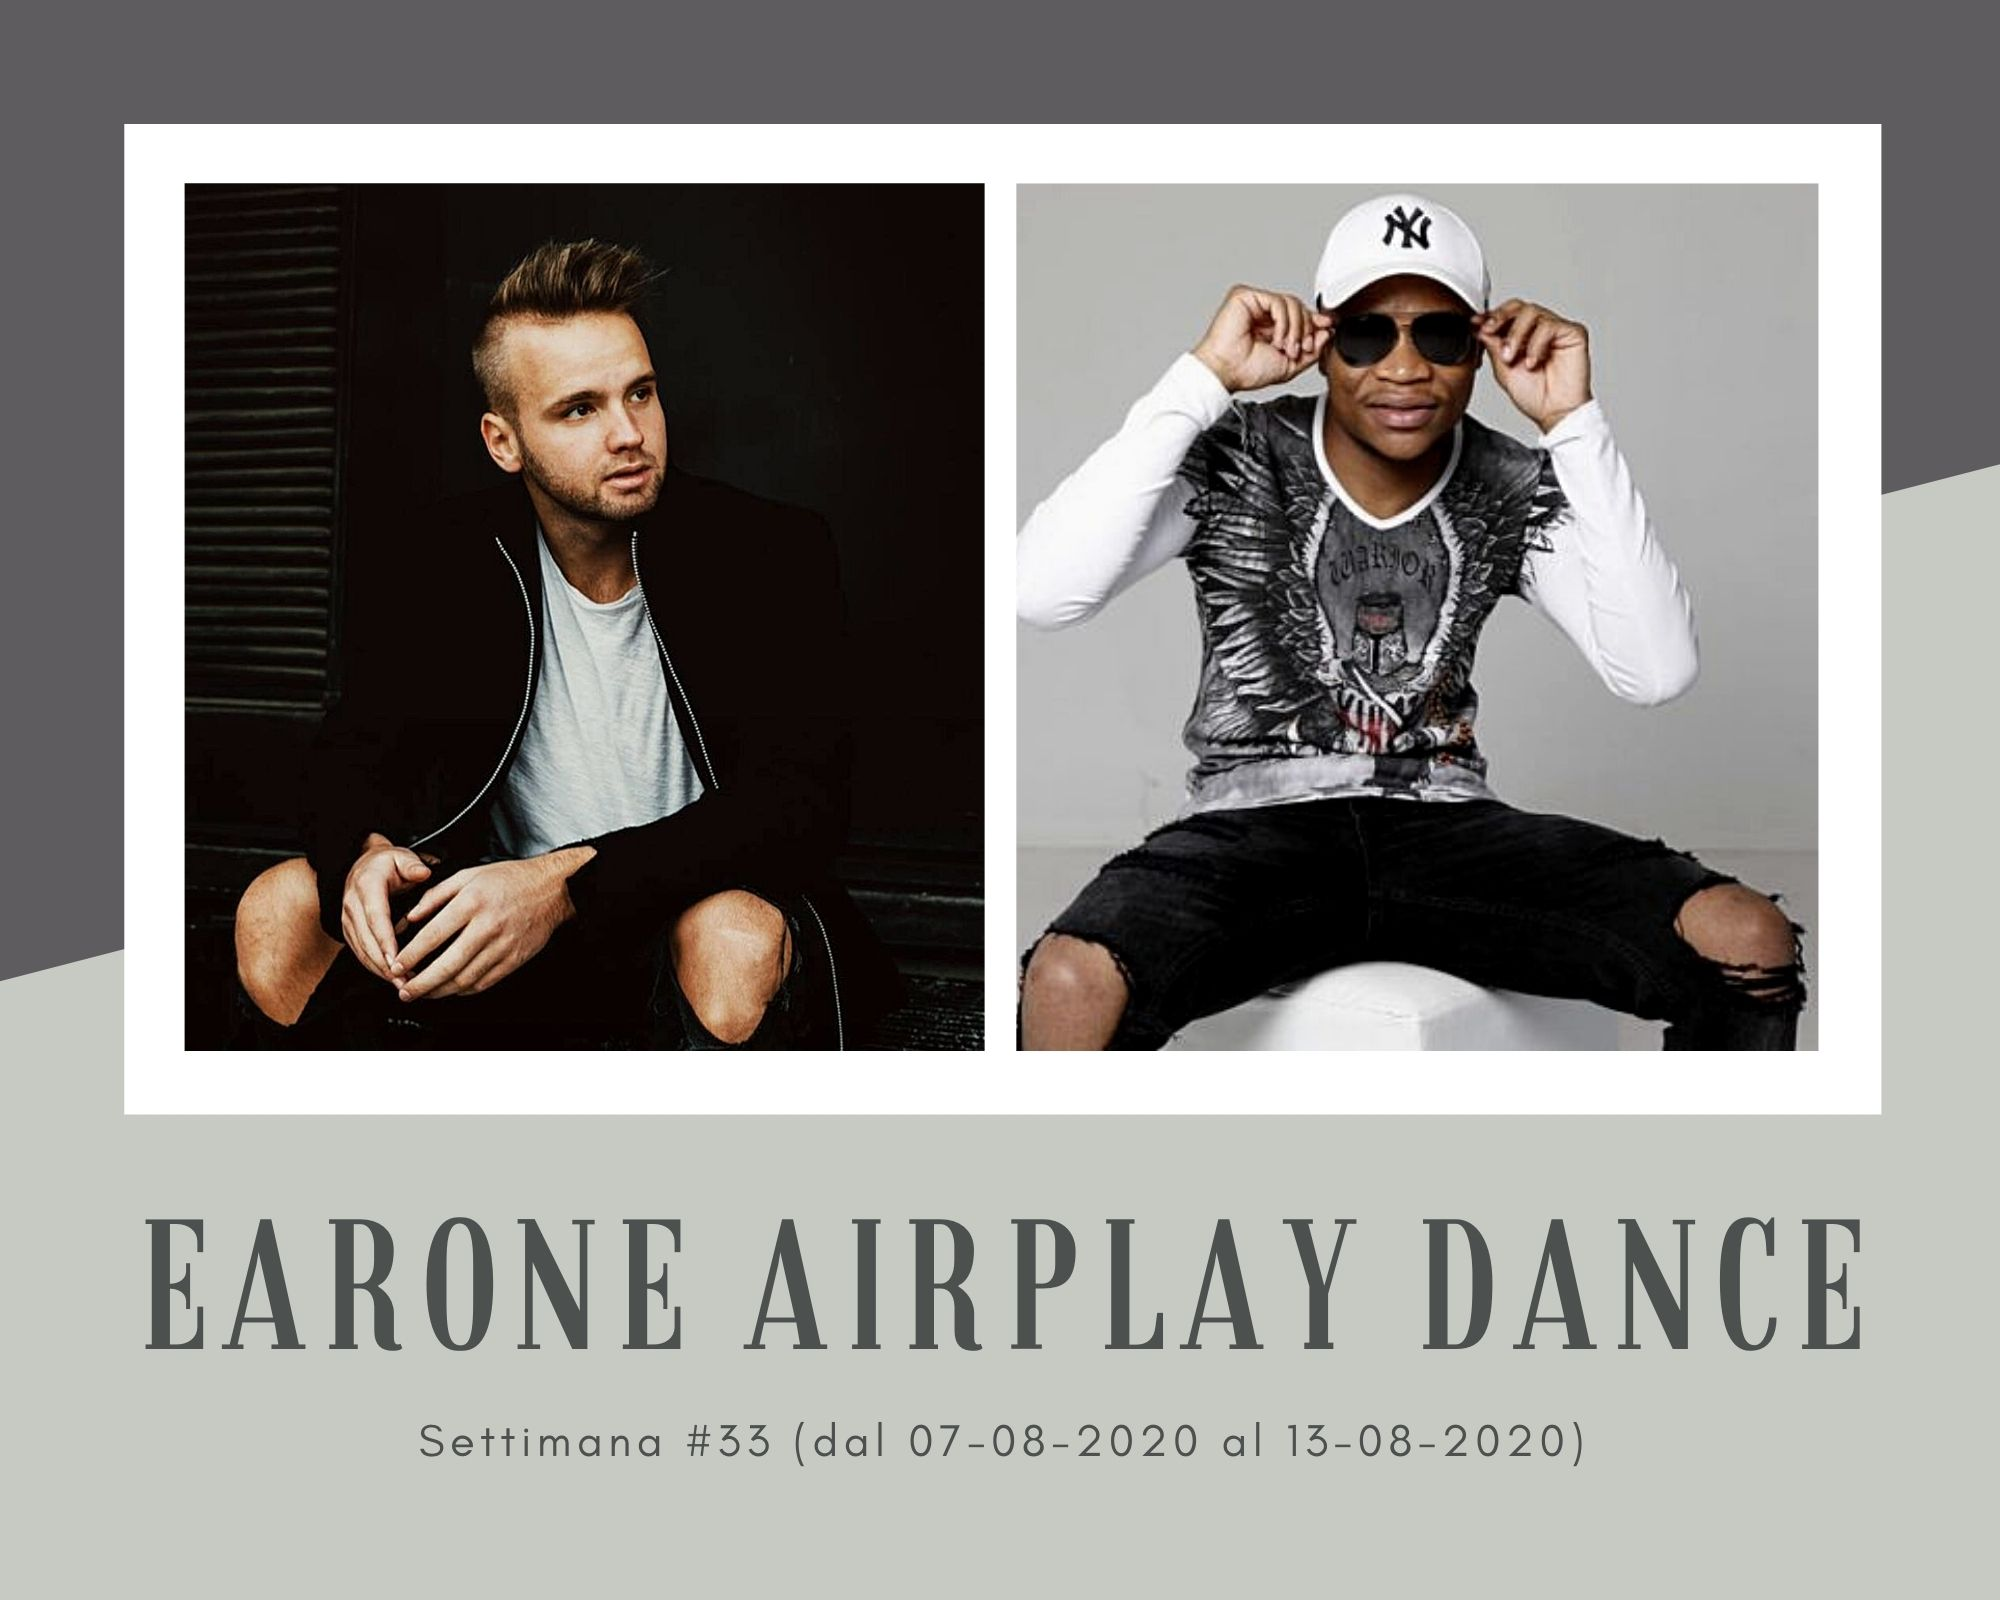 Classifica Radio EarOne Airplay Dance, week 33: un'estate di coppia. Spopolano Purple Disco Machine & Sophie and the Giants, Topic & A7s, Master KG & Nomcebo Zikode